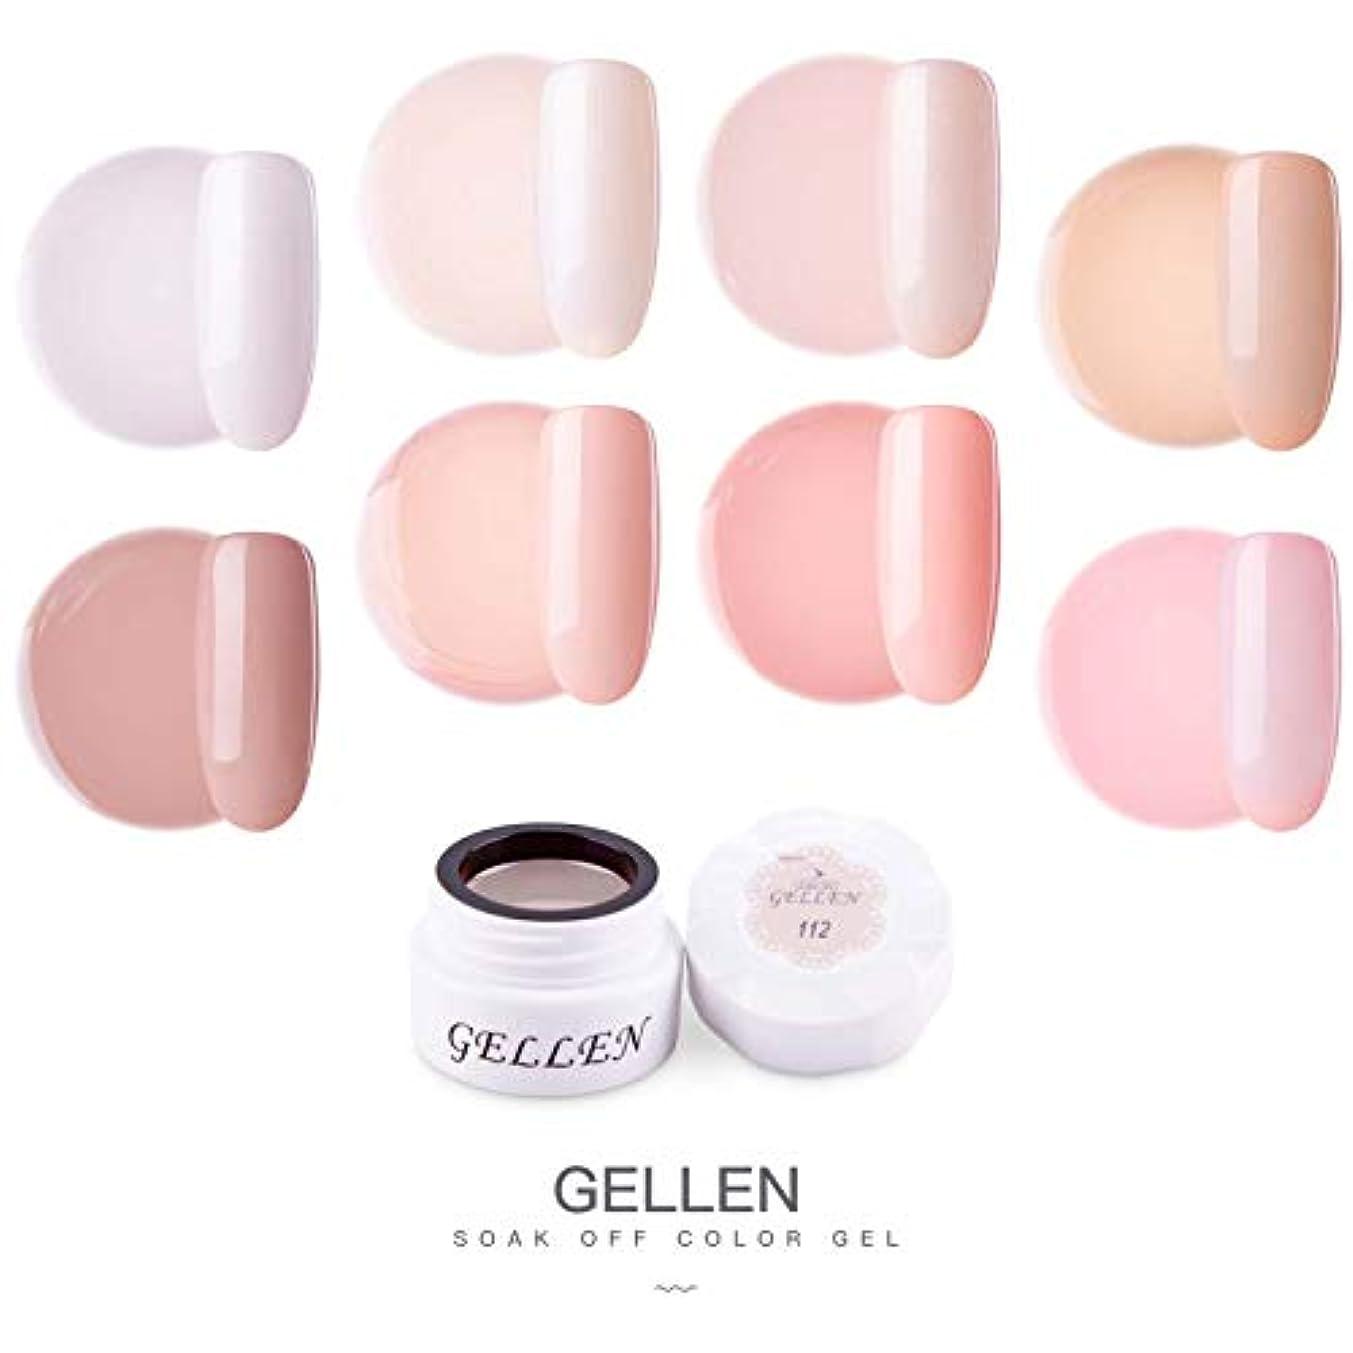 Gellen カラージェル 8色 セット[ヌードピンク系]高品質 5g ジェルネイル カラー ネイルブラシ付き